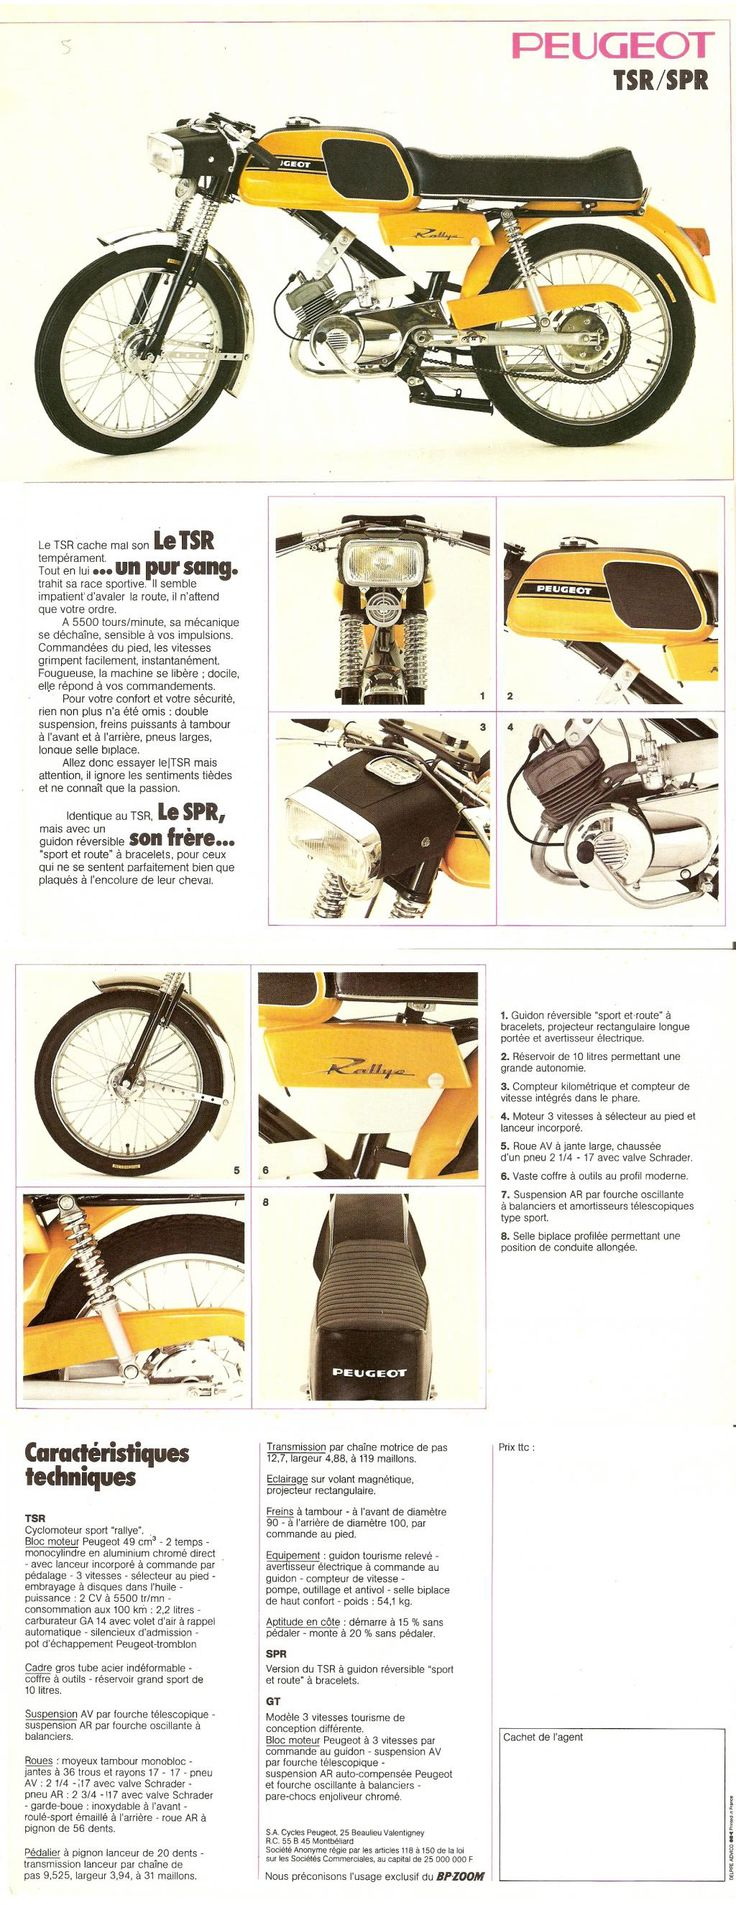 Peugeot TSR/SPR